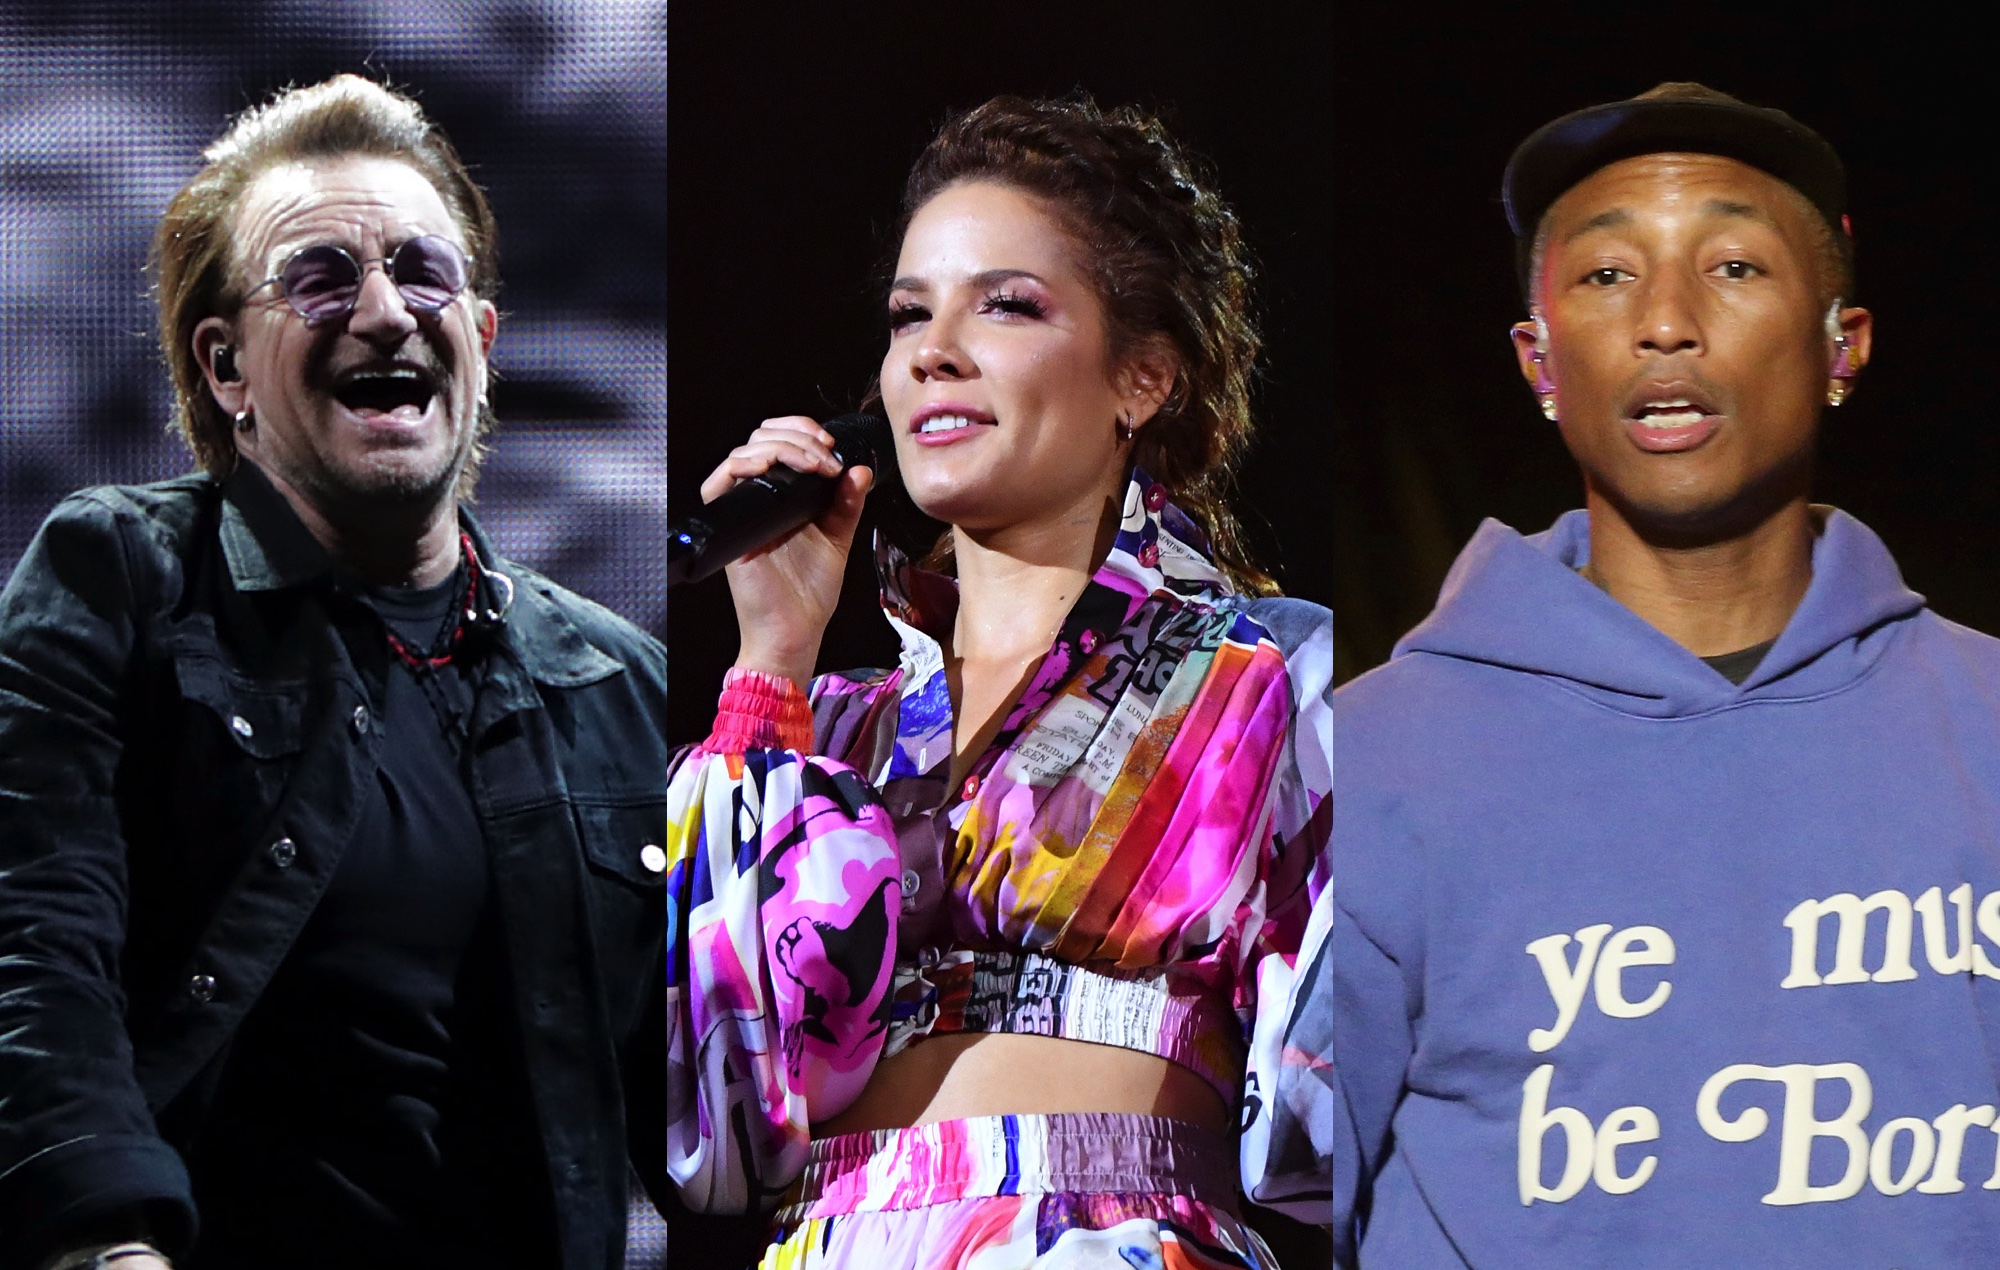 Bono, Halsey & Pharrell Williams all cast in 'Sing 2'